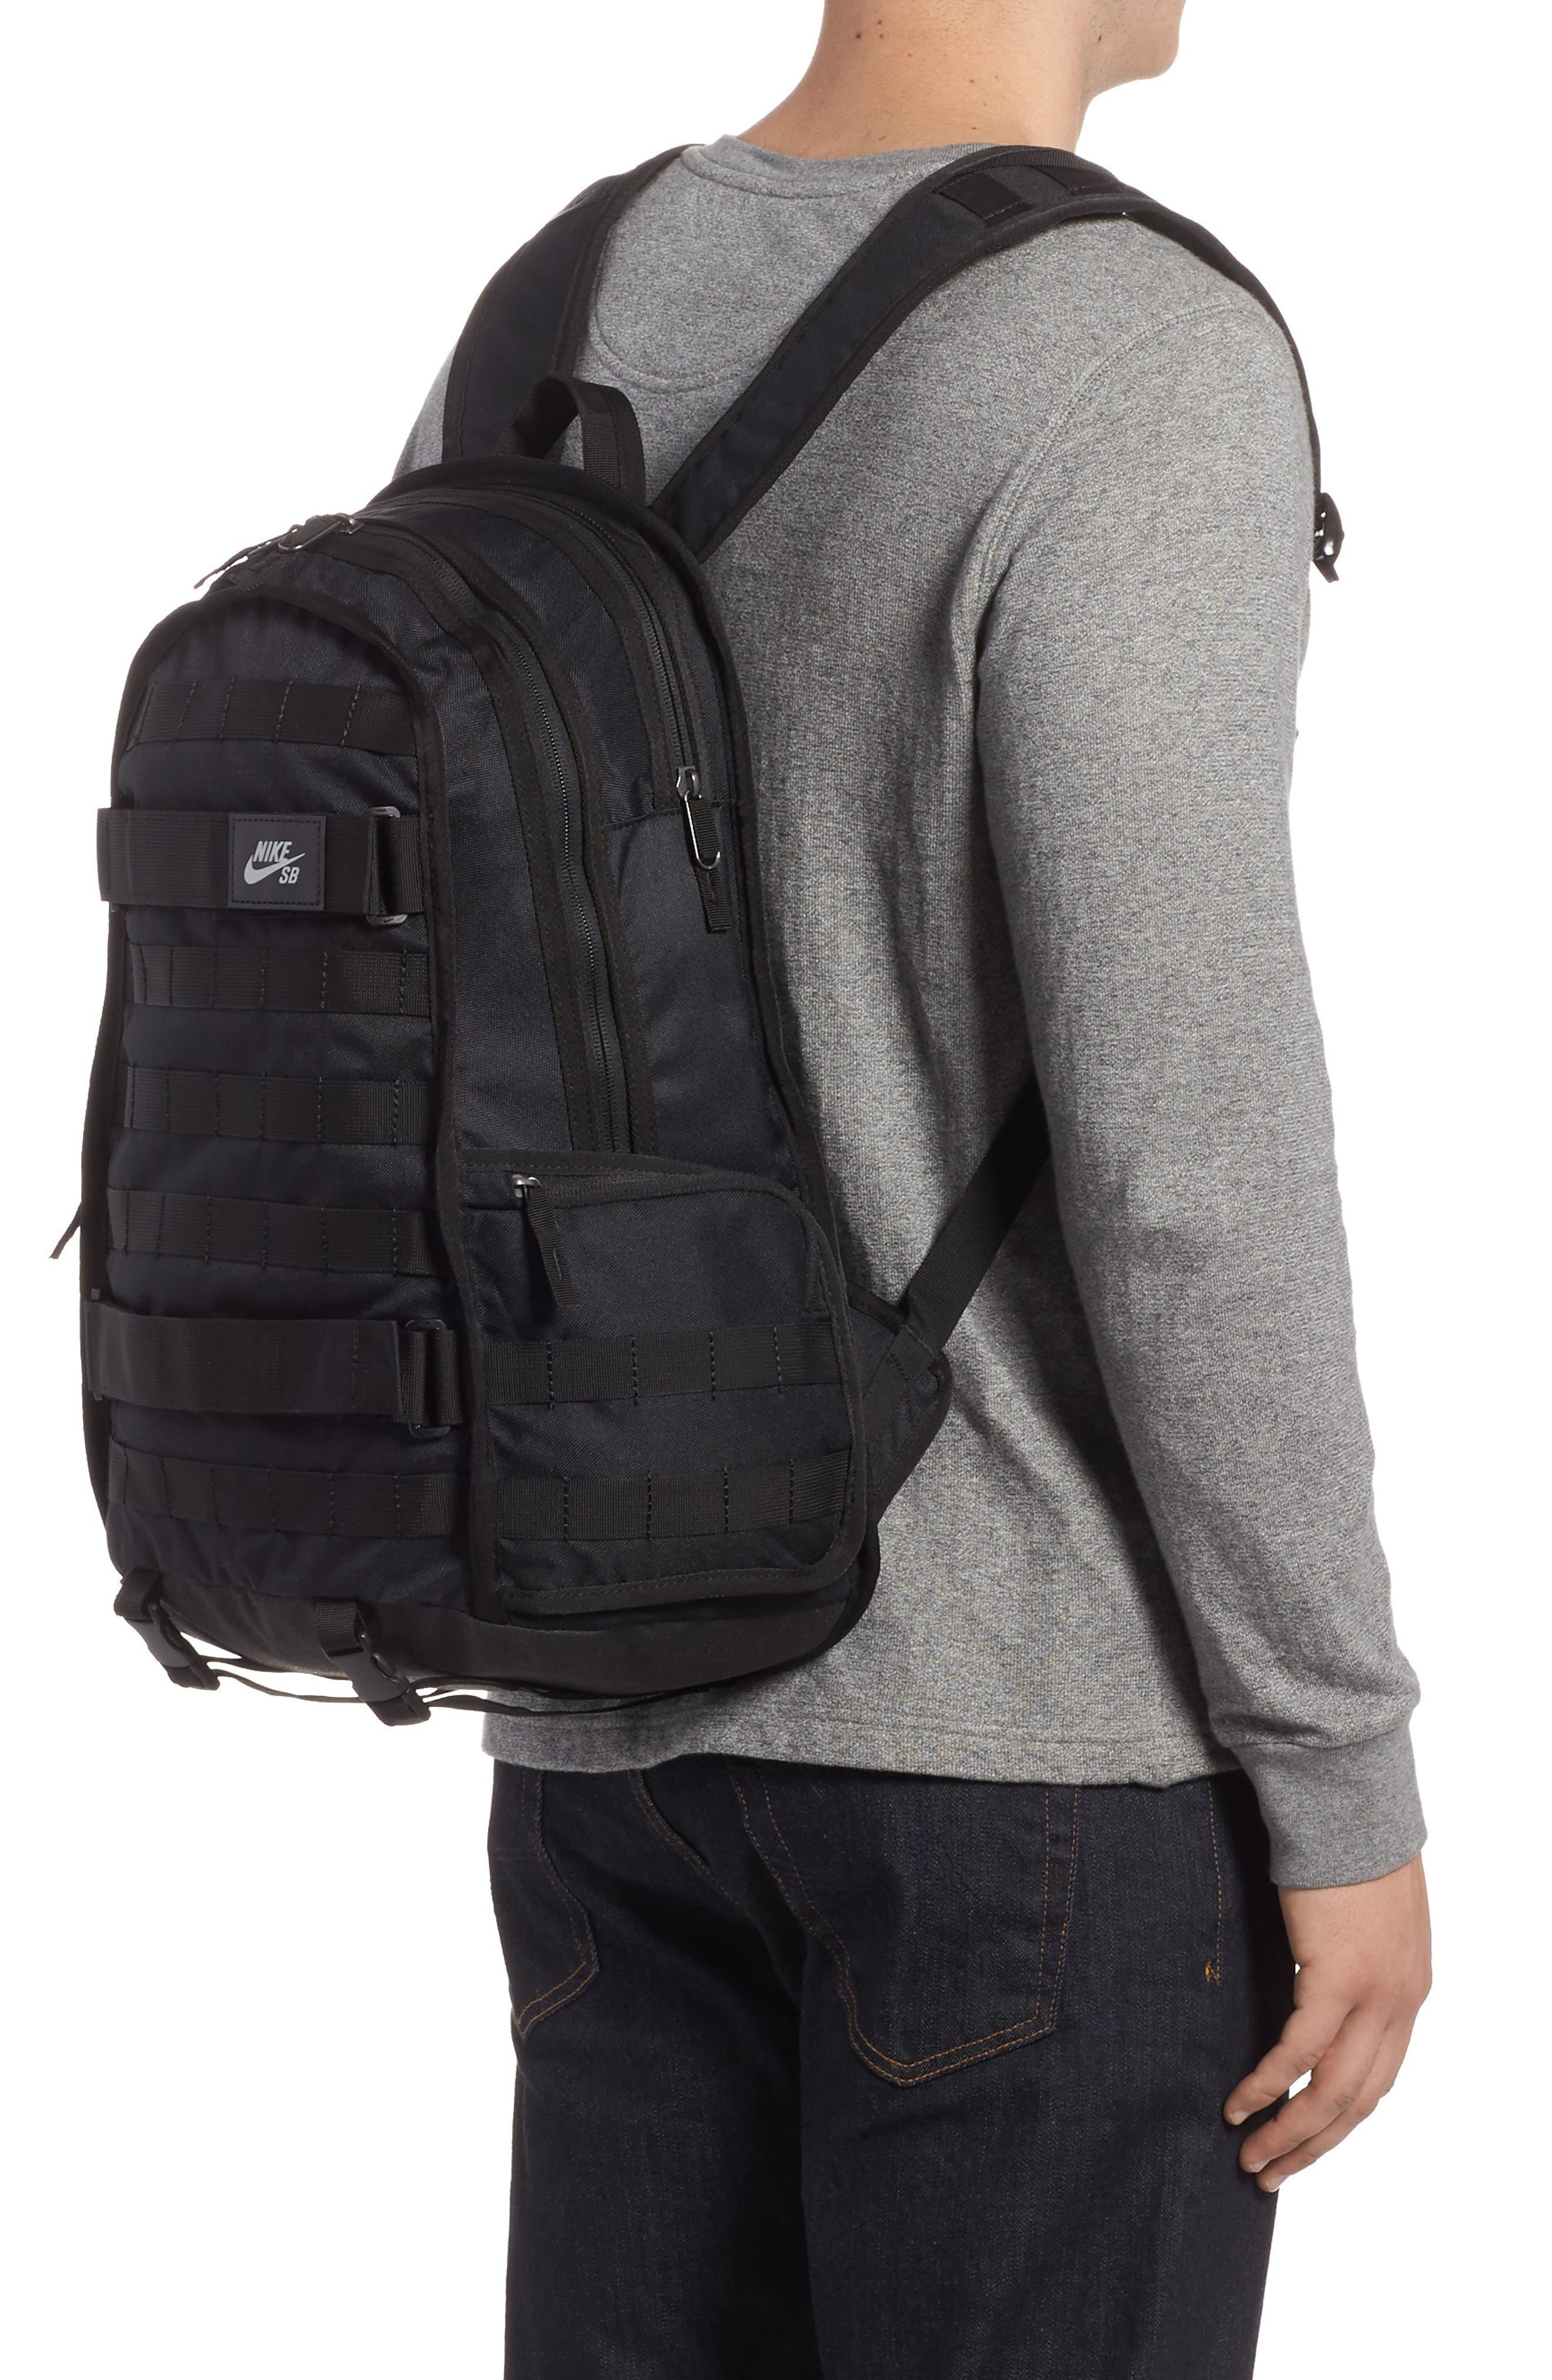 RPM Backpack,                             Alternate thumbnail 2, color,                             BLACK/ BLACK/ BLACK